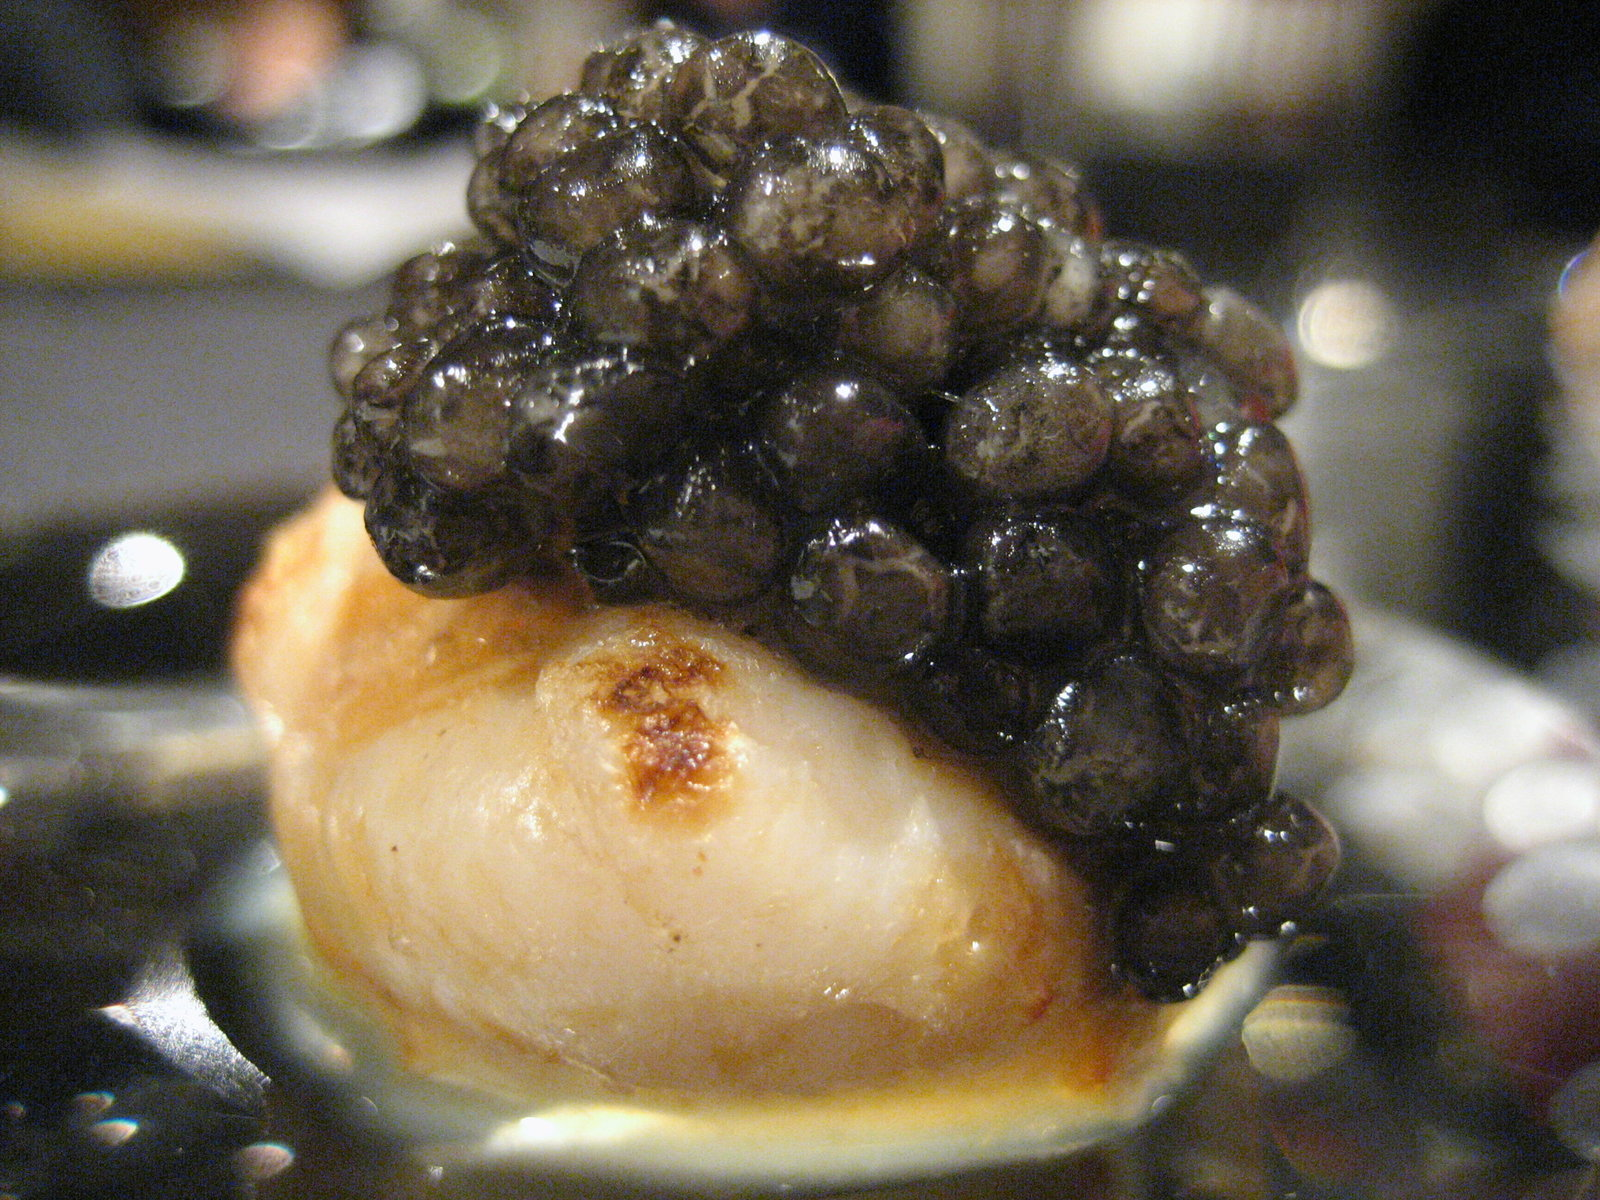 RyuGin - Scallop with Caviar